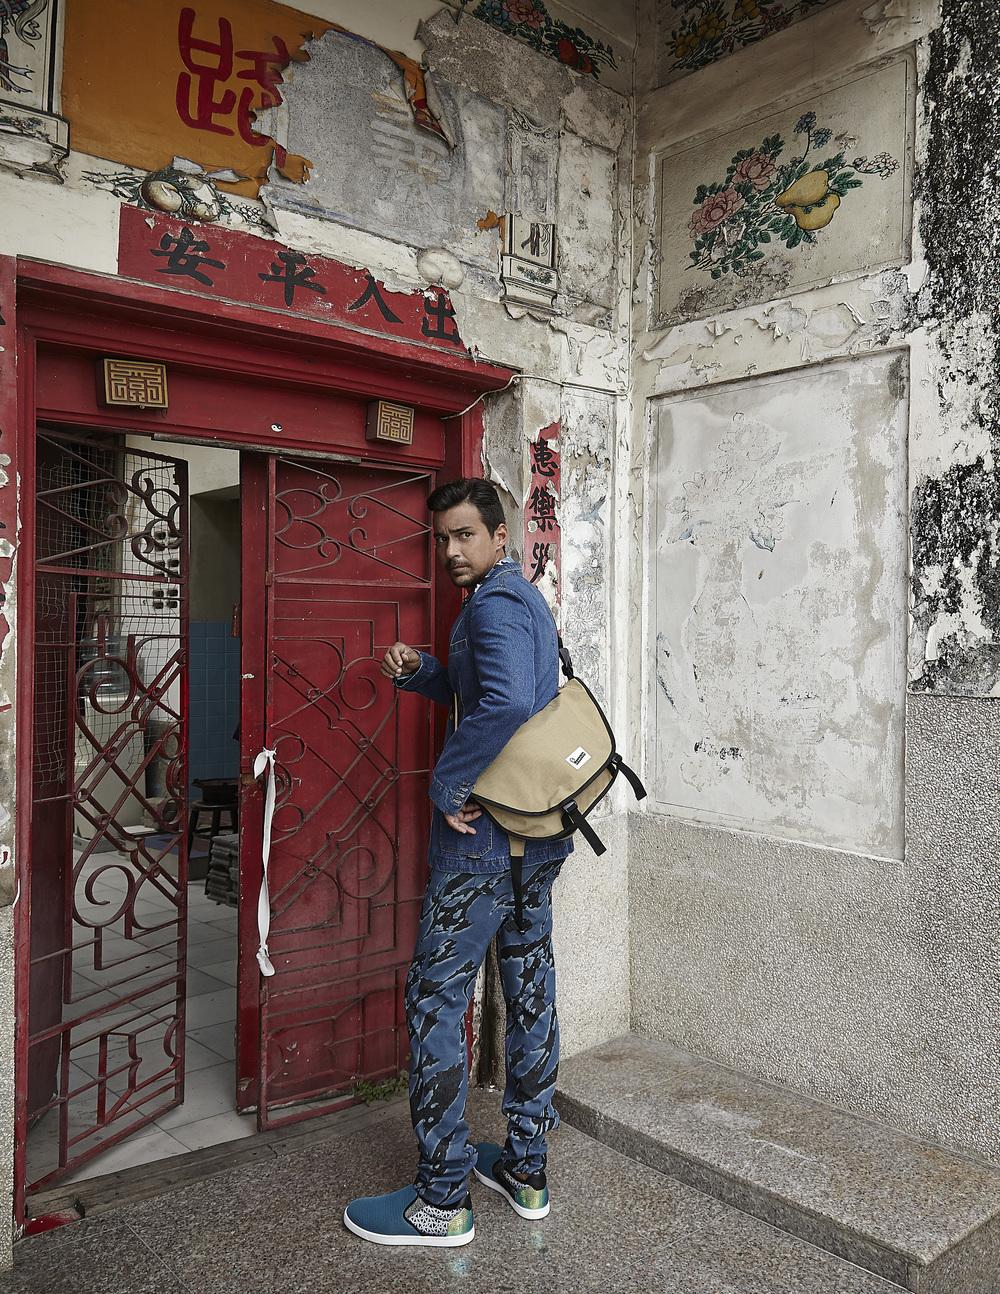 Clothes: Playhound / Bag: Crumpler / Shoes: Christian Louboutin